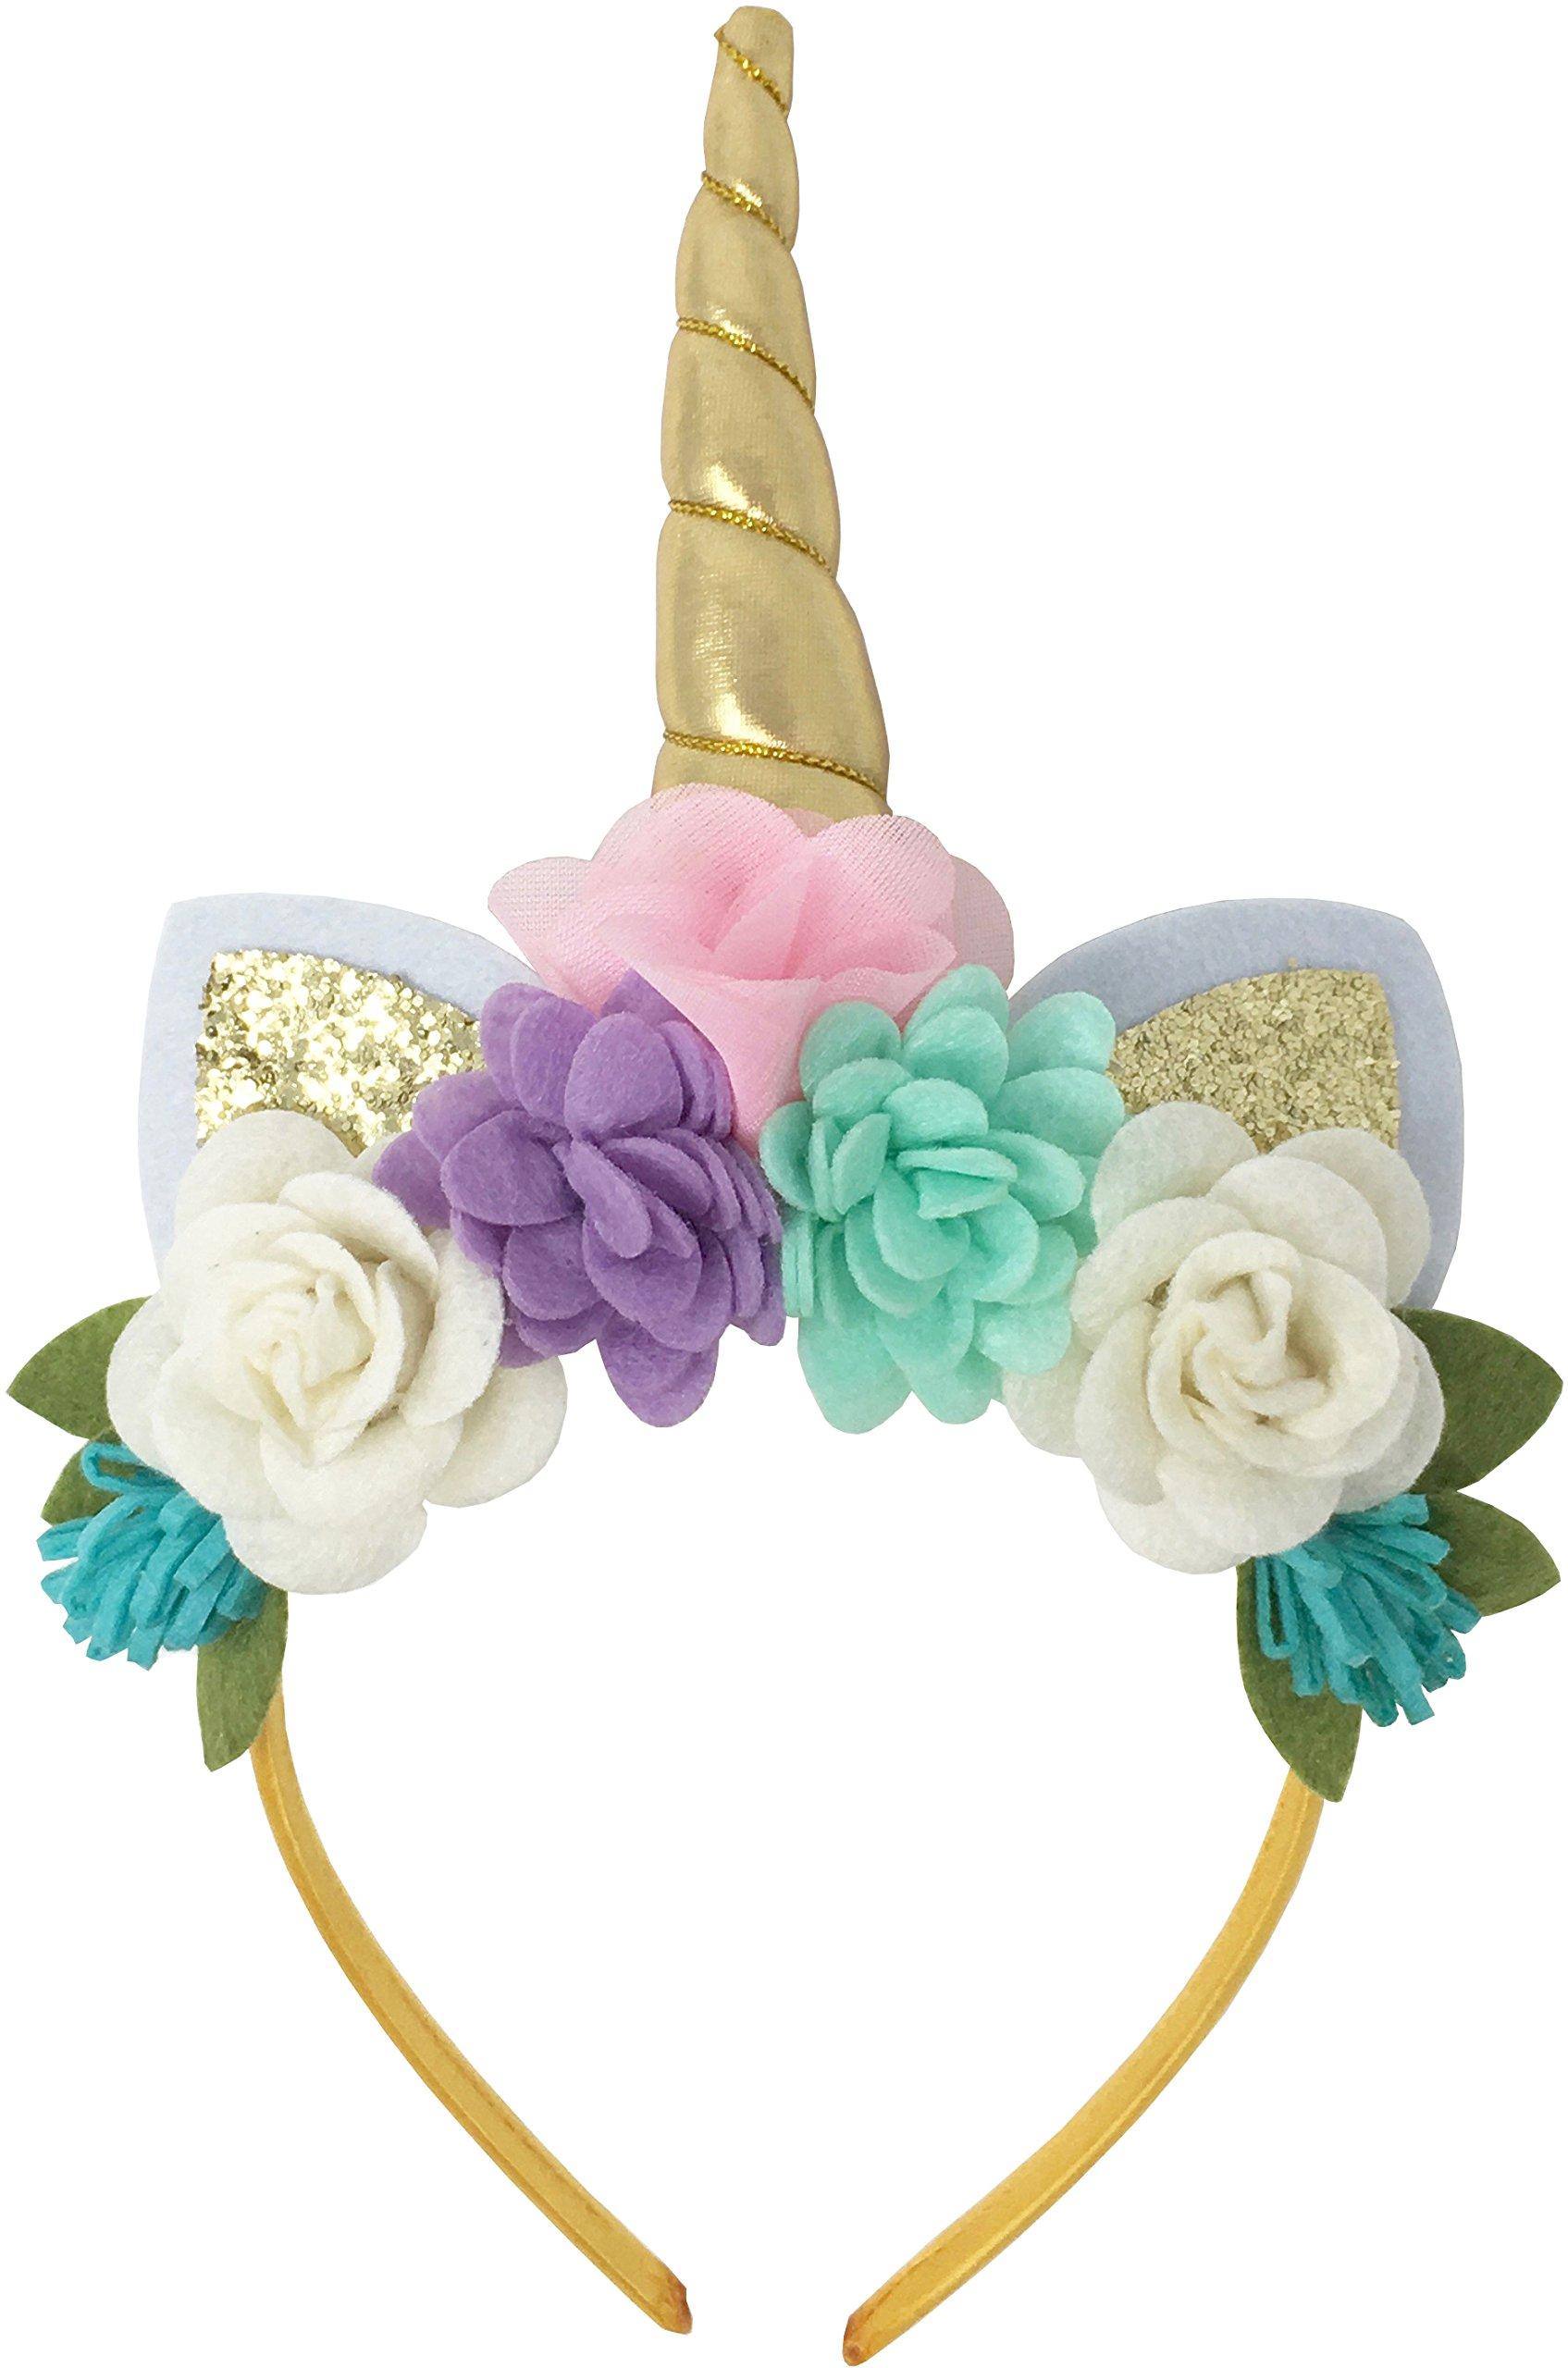 Posh Peanut Unicorn Childrens Party Hat Horn Glitter Hard Headband Spiral Unicorn Horn Photo Props Cosplay (Pink, Purple , Teal)